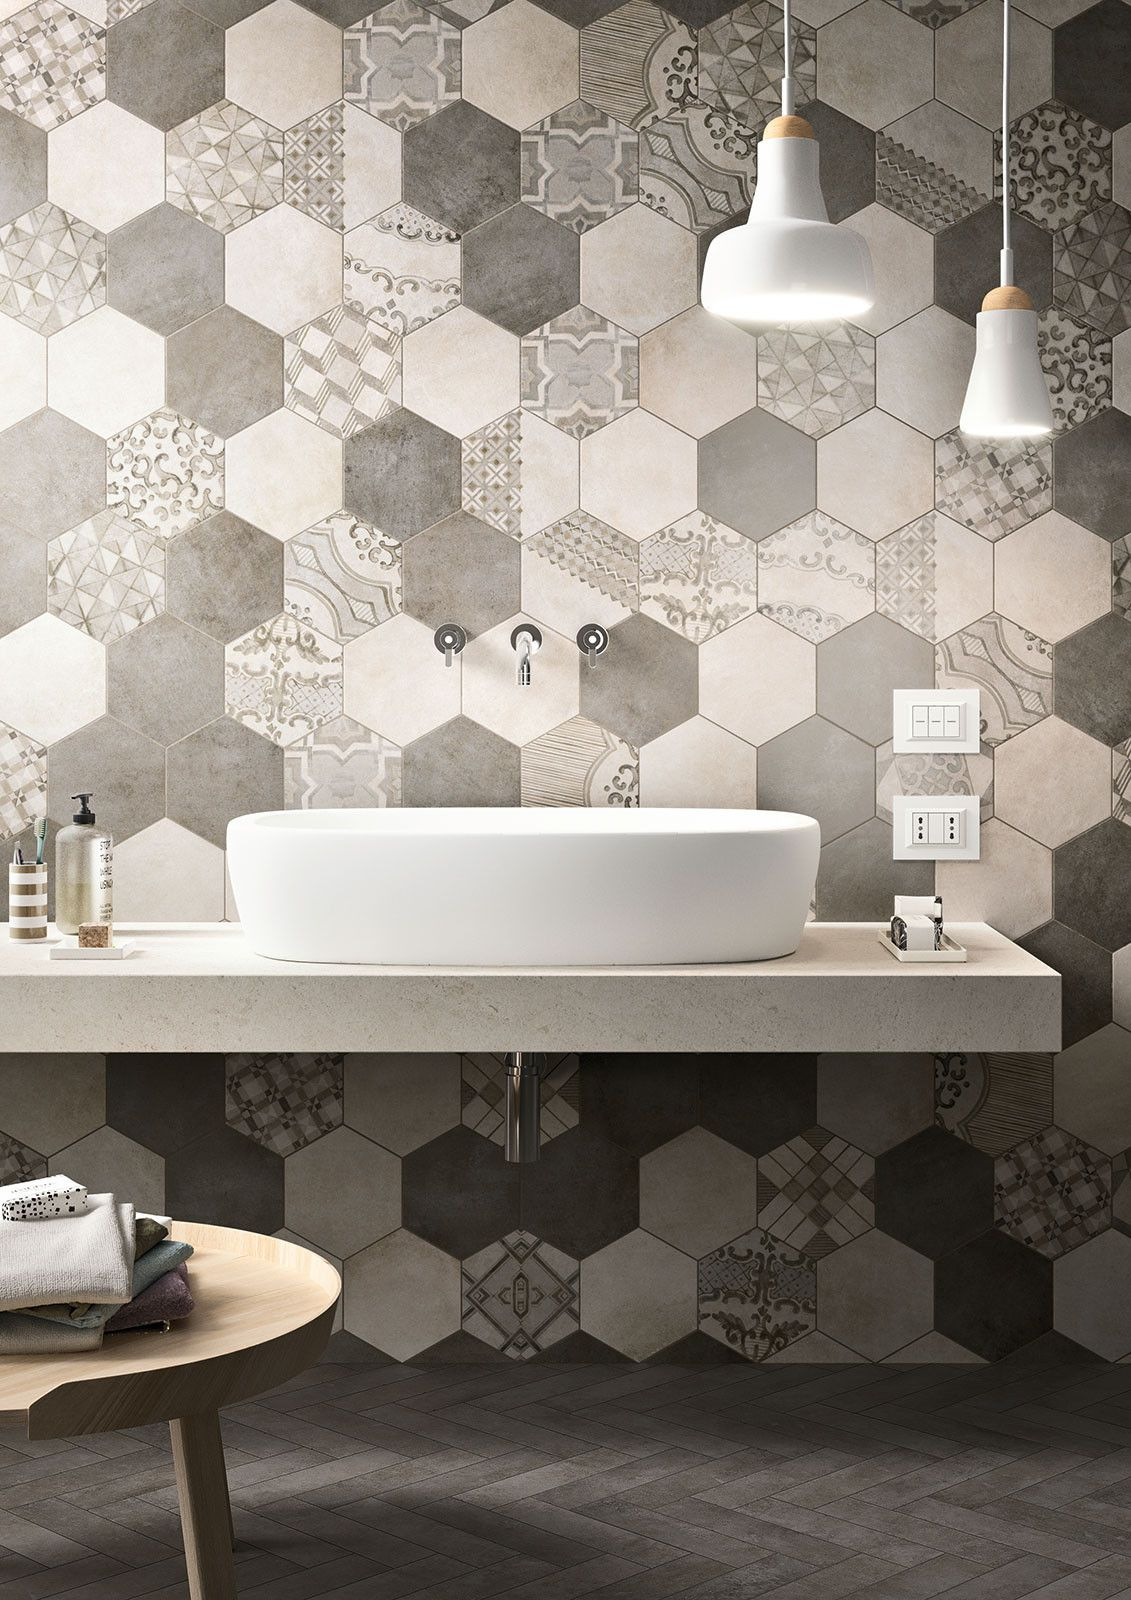 Marazzi #Clays Decoro 21x18,2 cm MM7Z | #Gres #decorati #21x18,2 ...